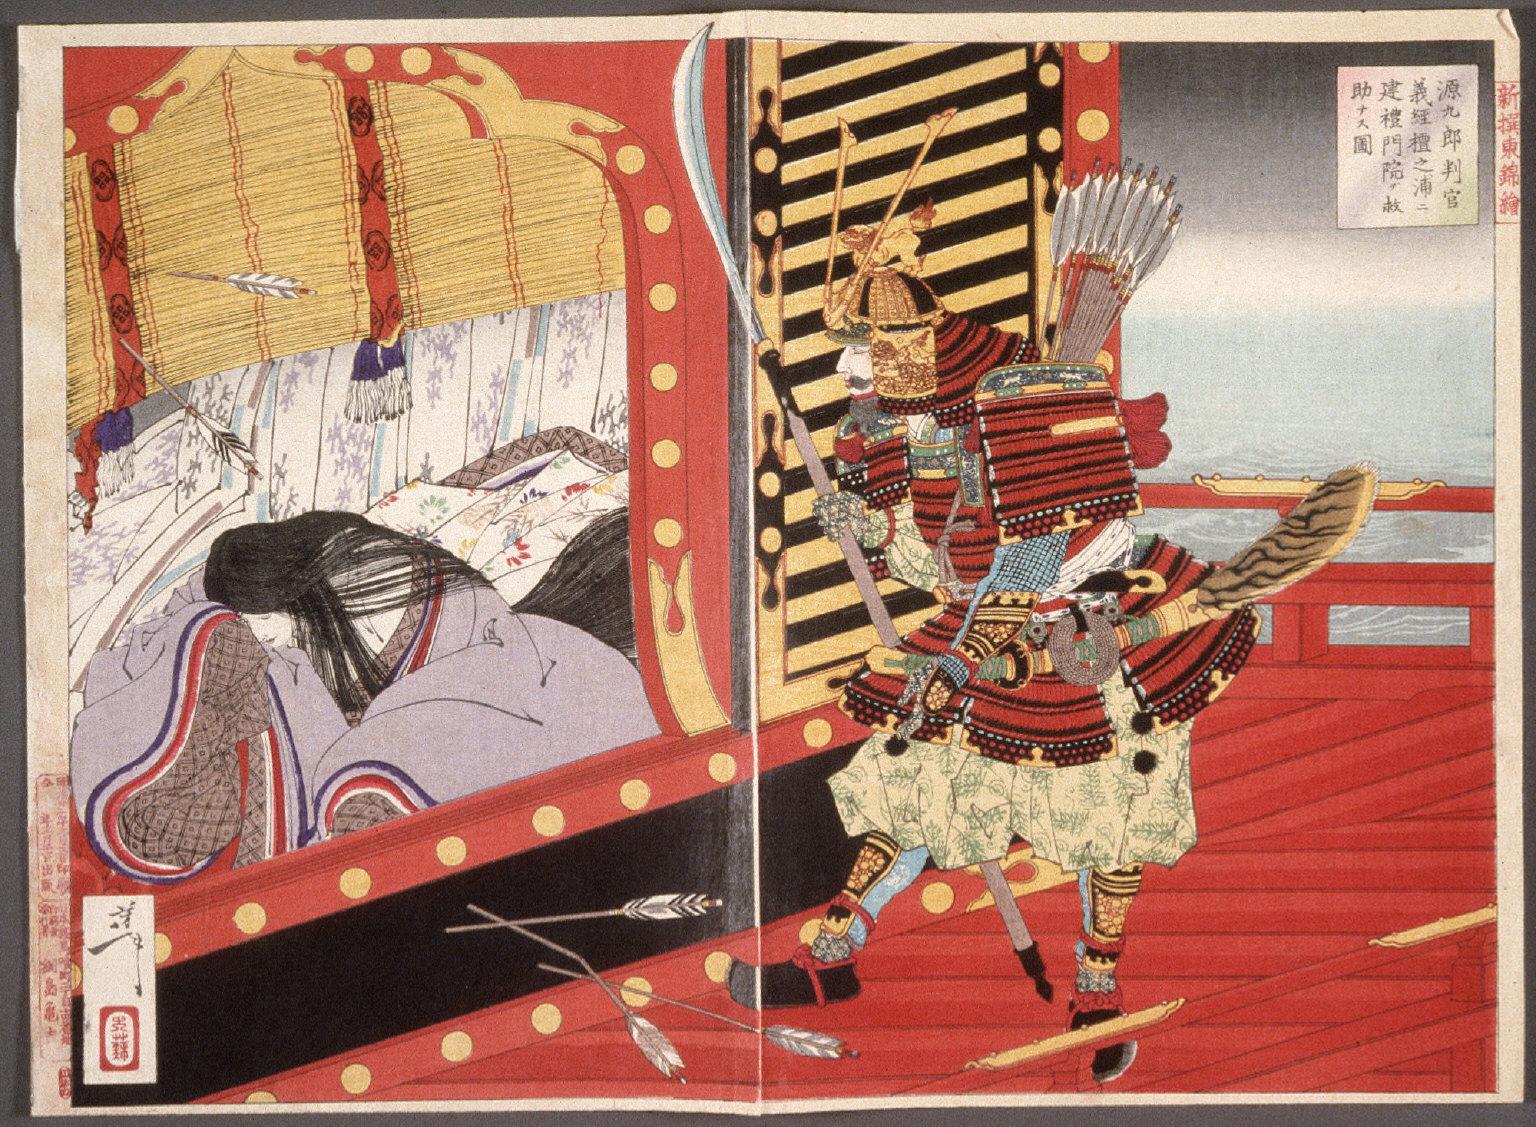 Minamoto no Yoshitsune Rescuing Kenrei Mon'in during the Battle of Dannoura